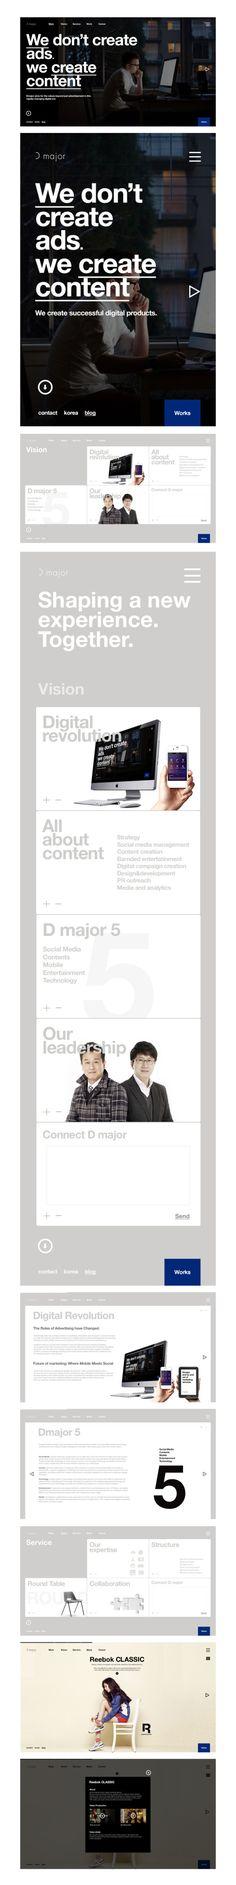 #website from Bory Kim #Twitpic #webdesign #website #responsive